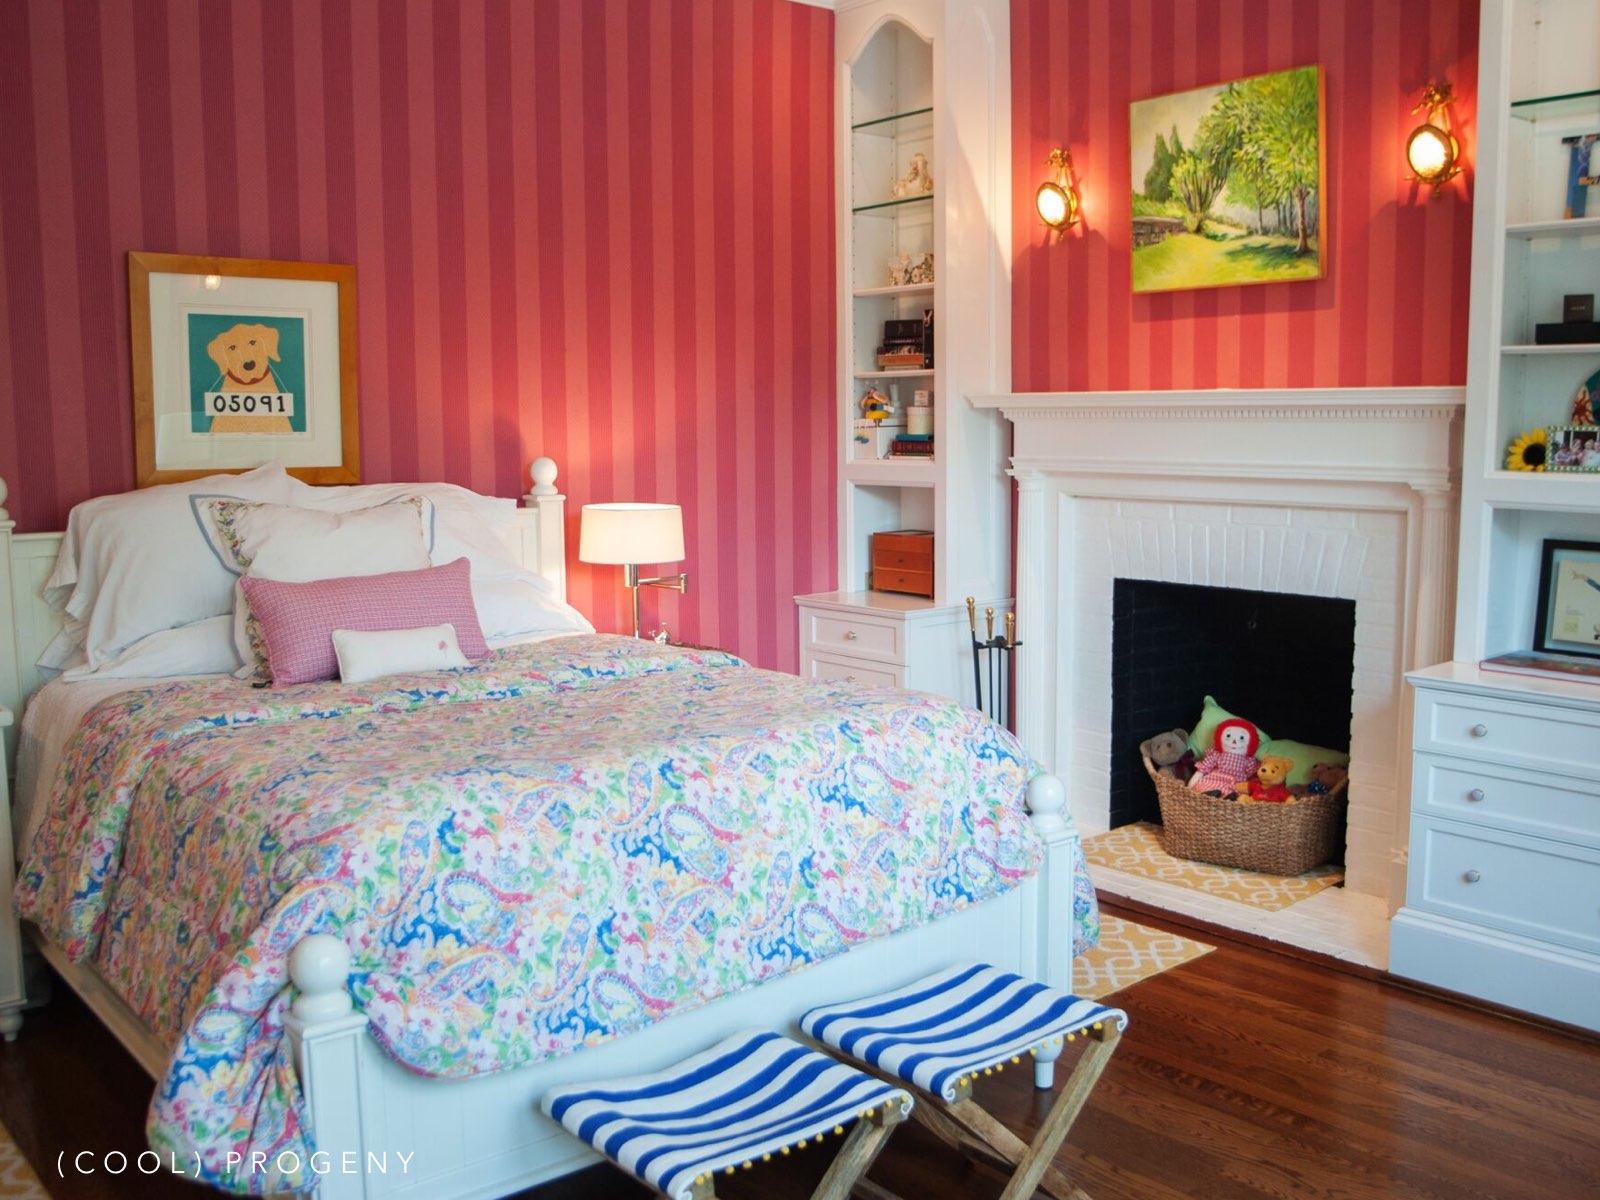 Girls Bedroom Designed to Grow - (cool) progeny